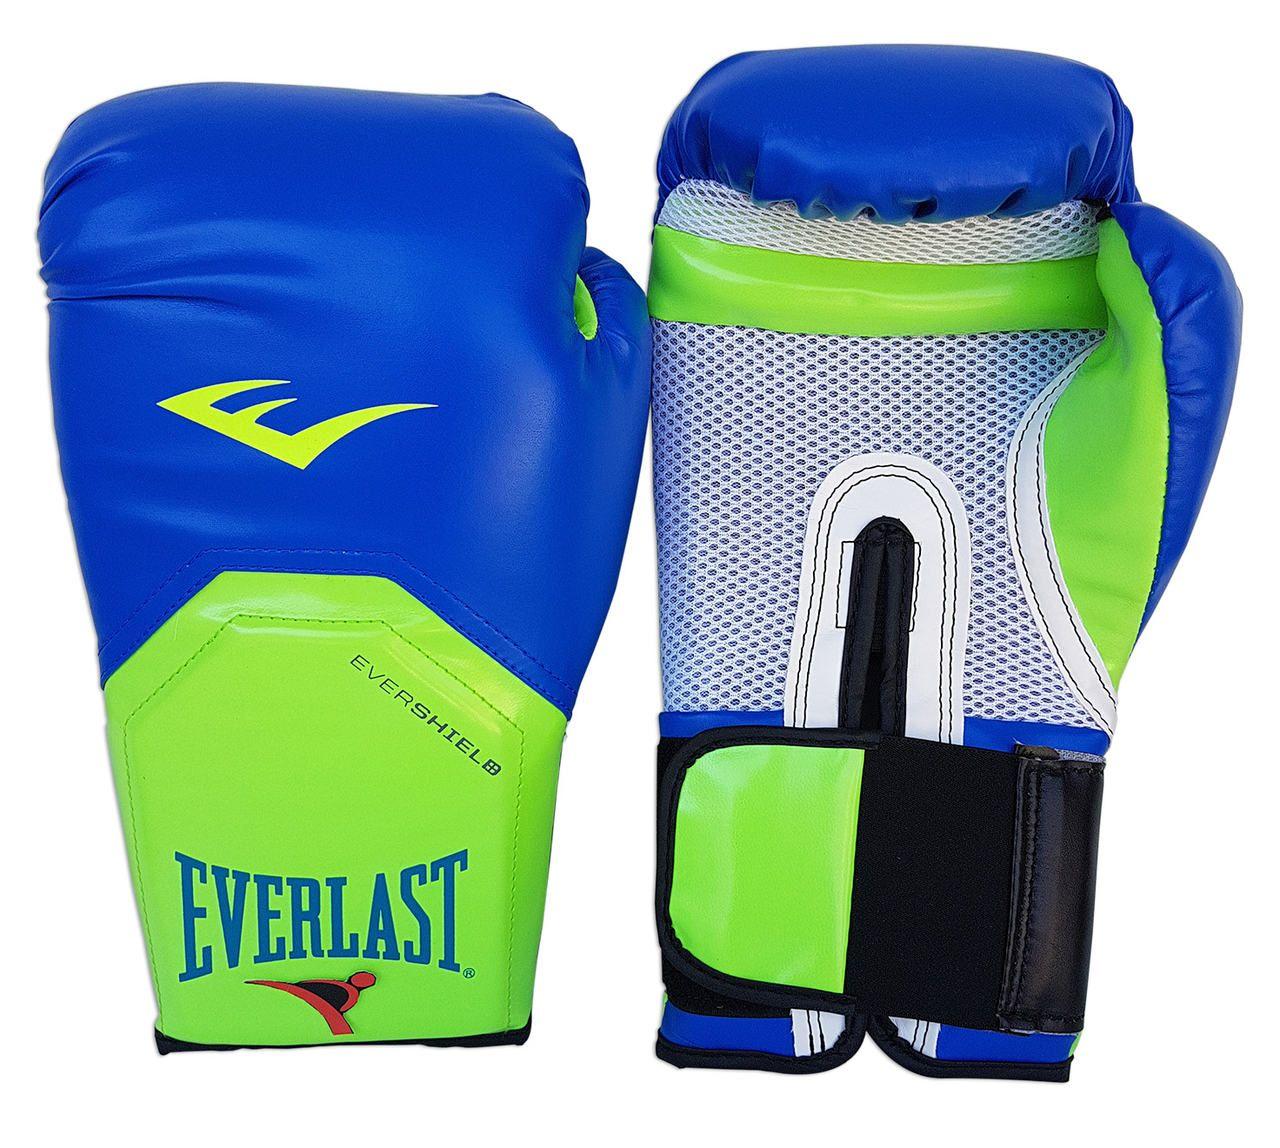 Luva de Boxe / Muay Thai 12oz - Azul com Verde - Pro Style - Everlast  - PRALUTA SHOP